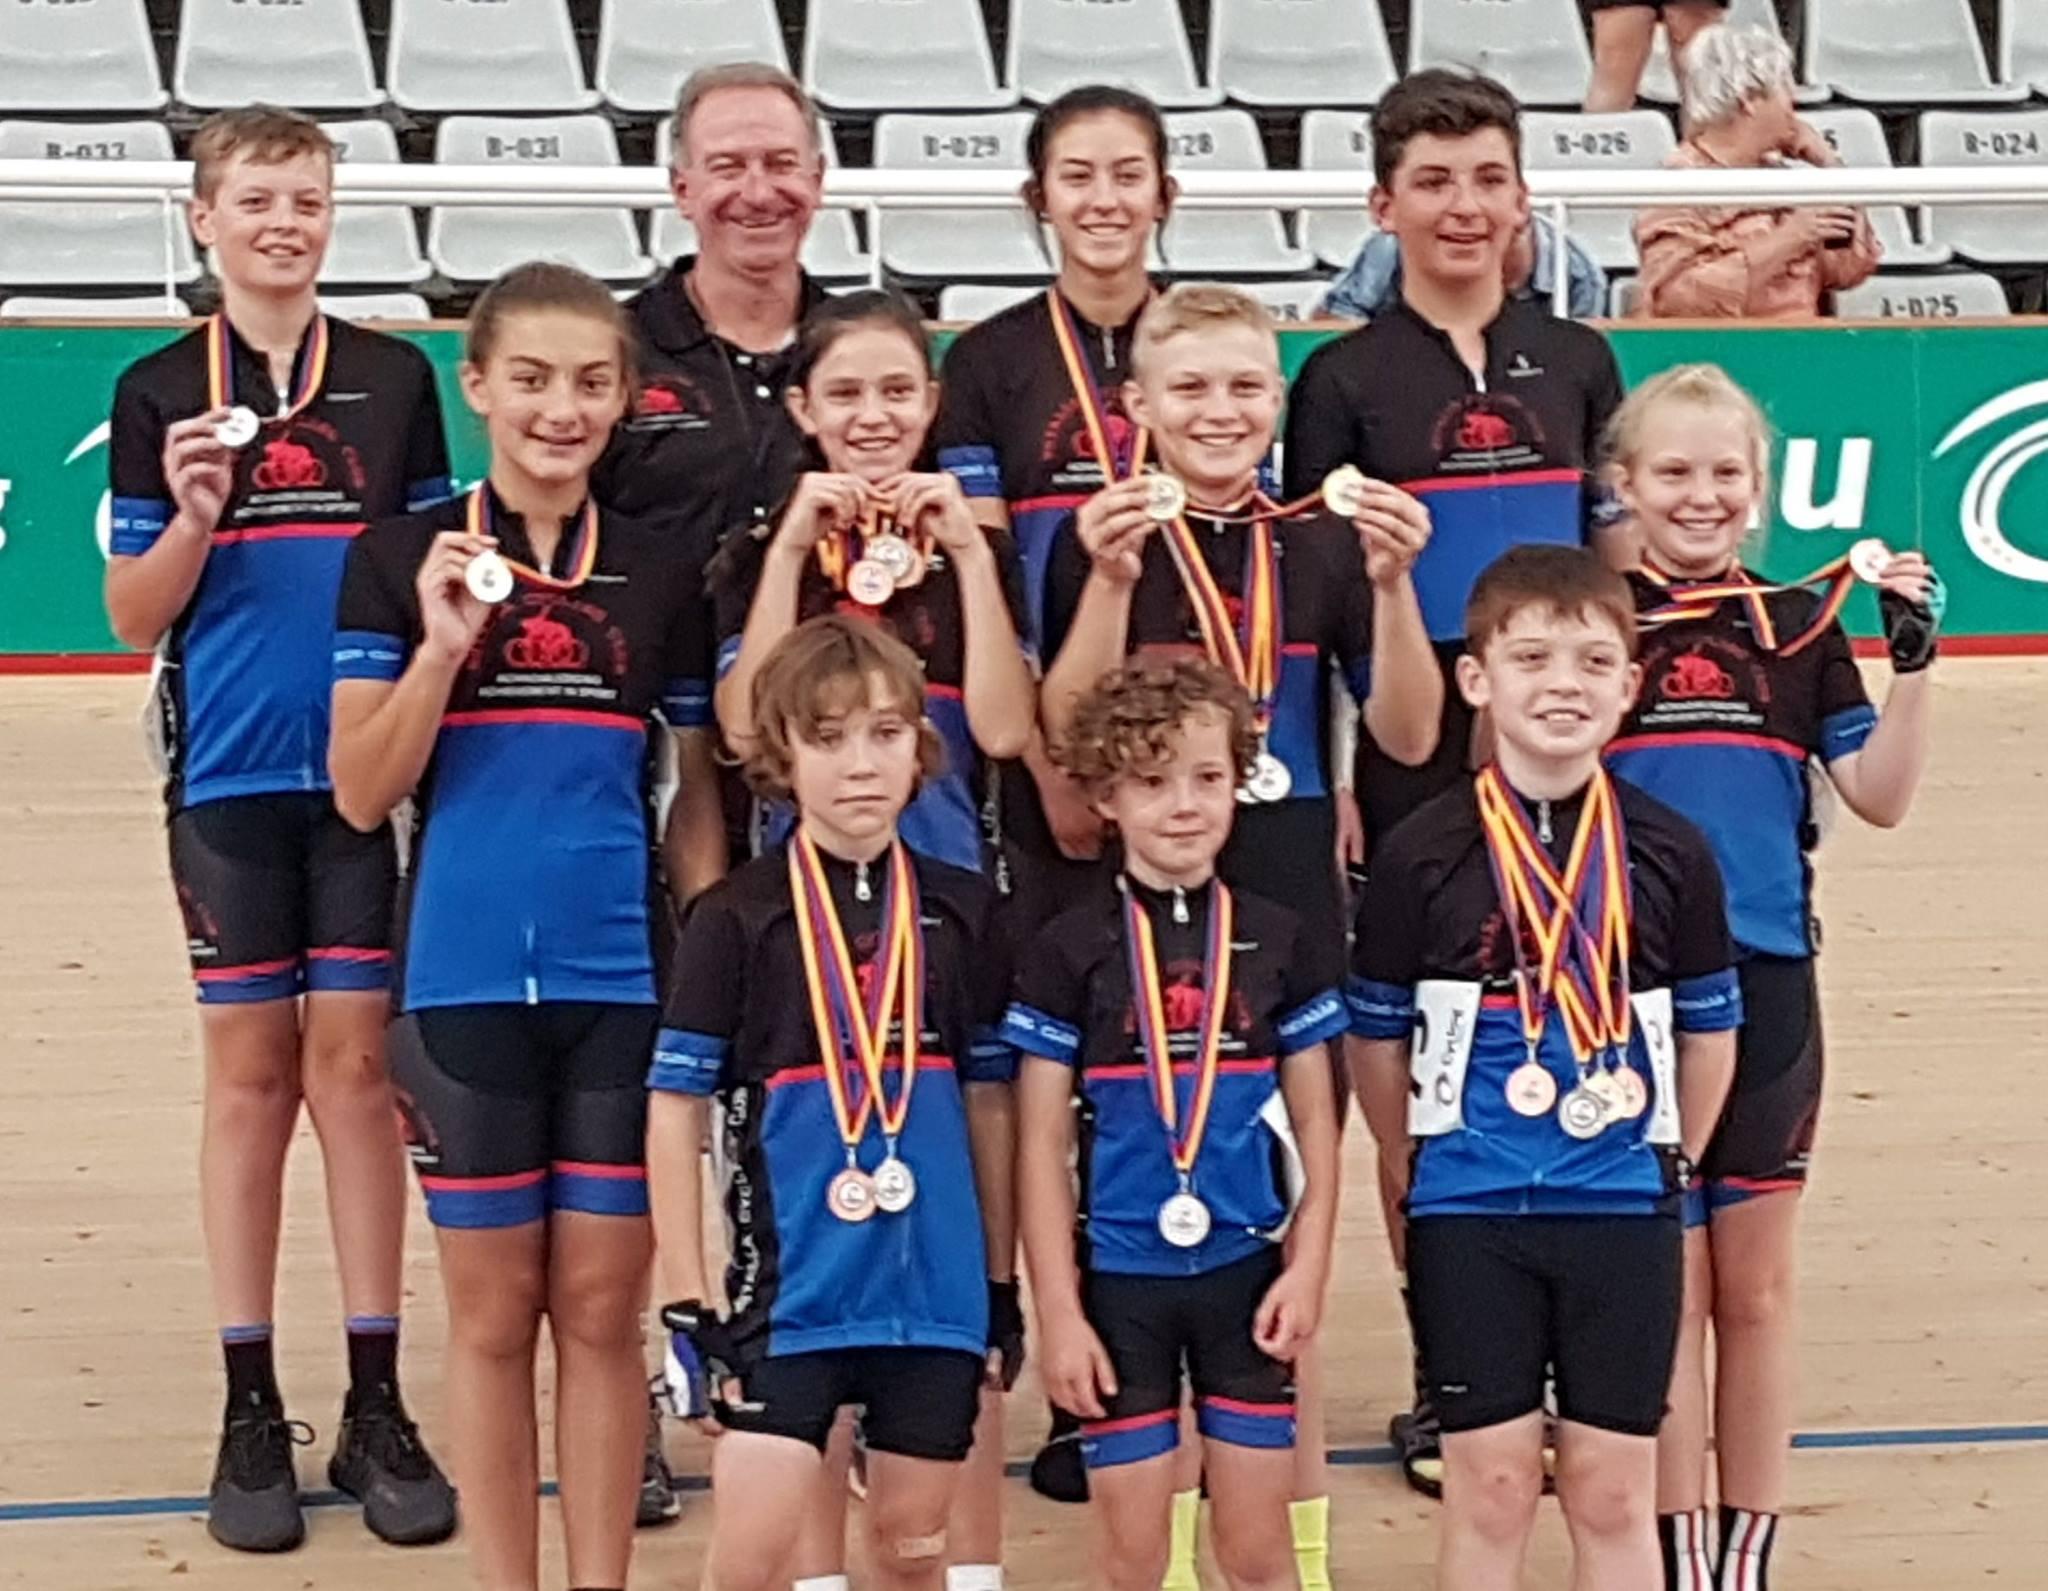 2017 State Junior Track Championship